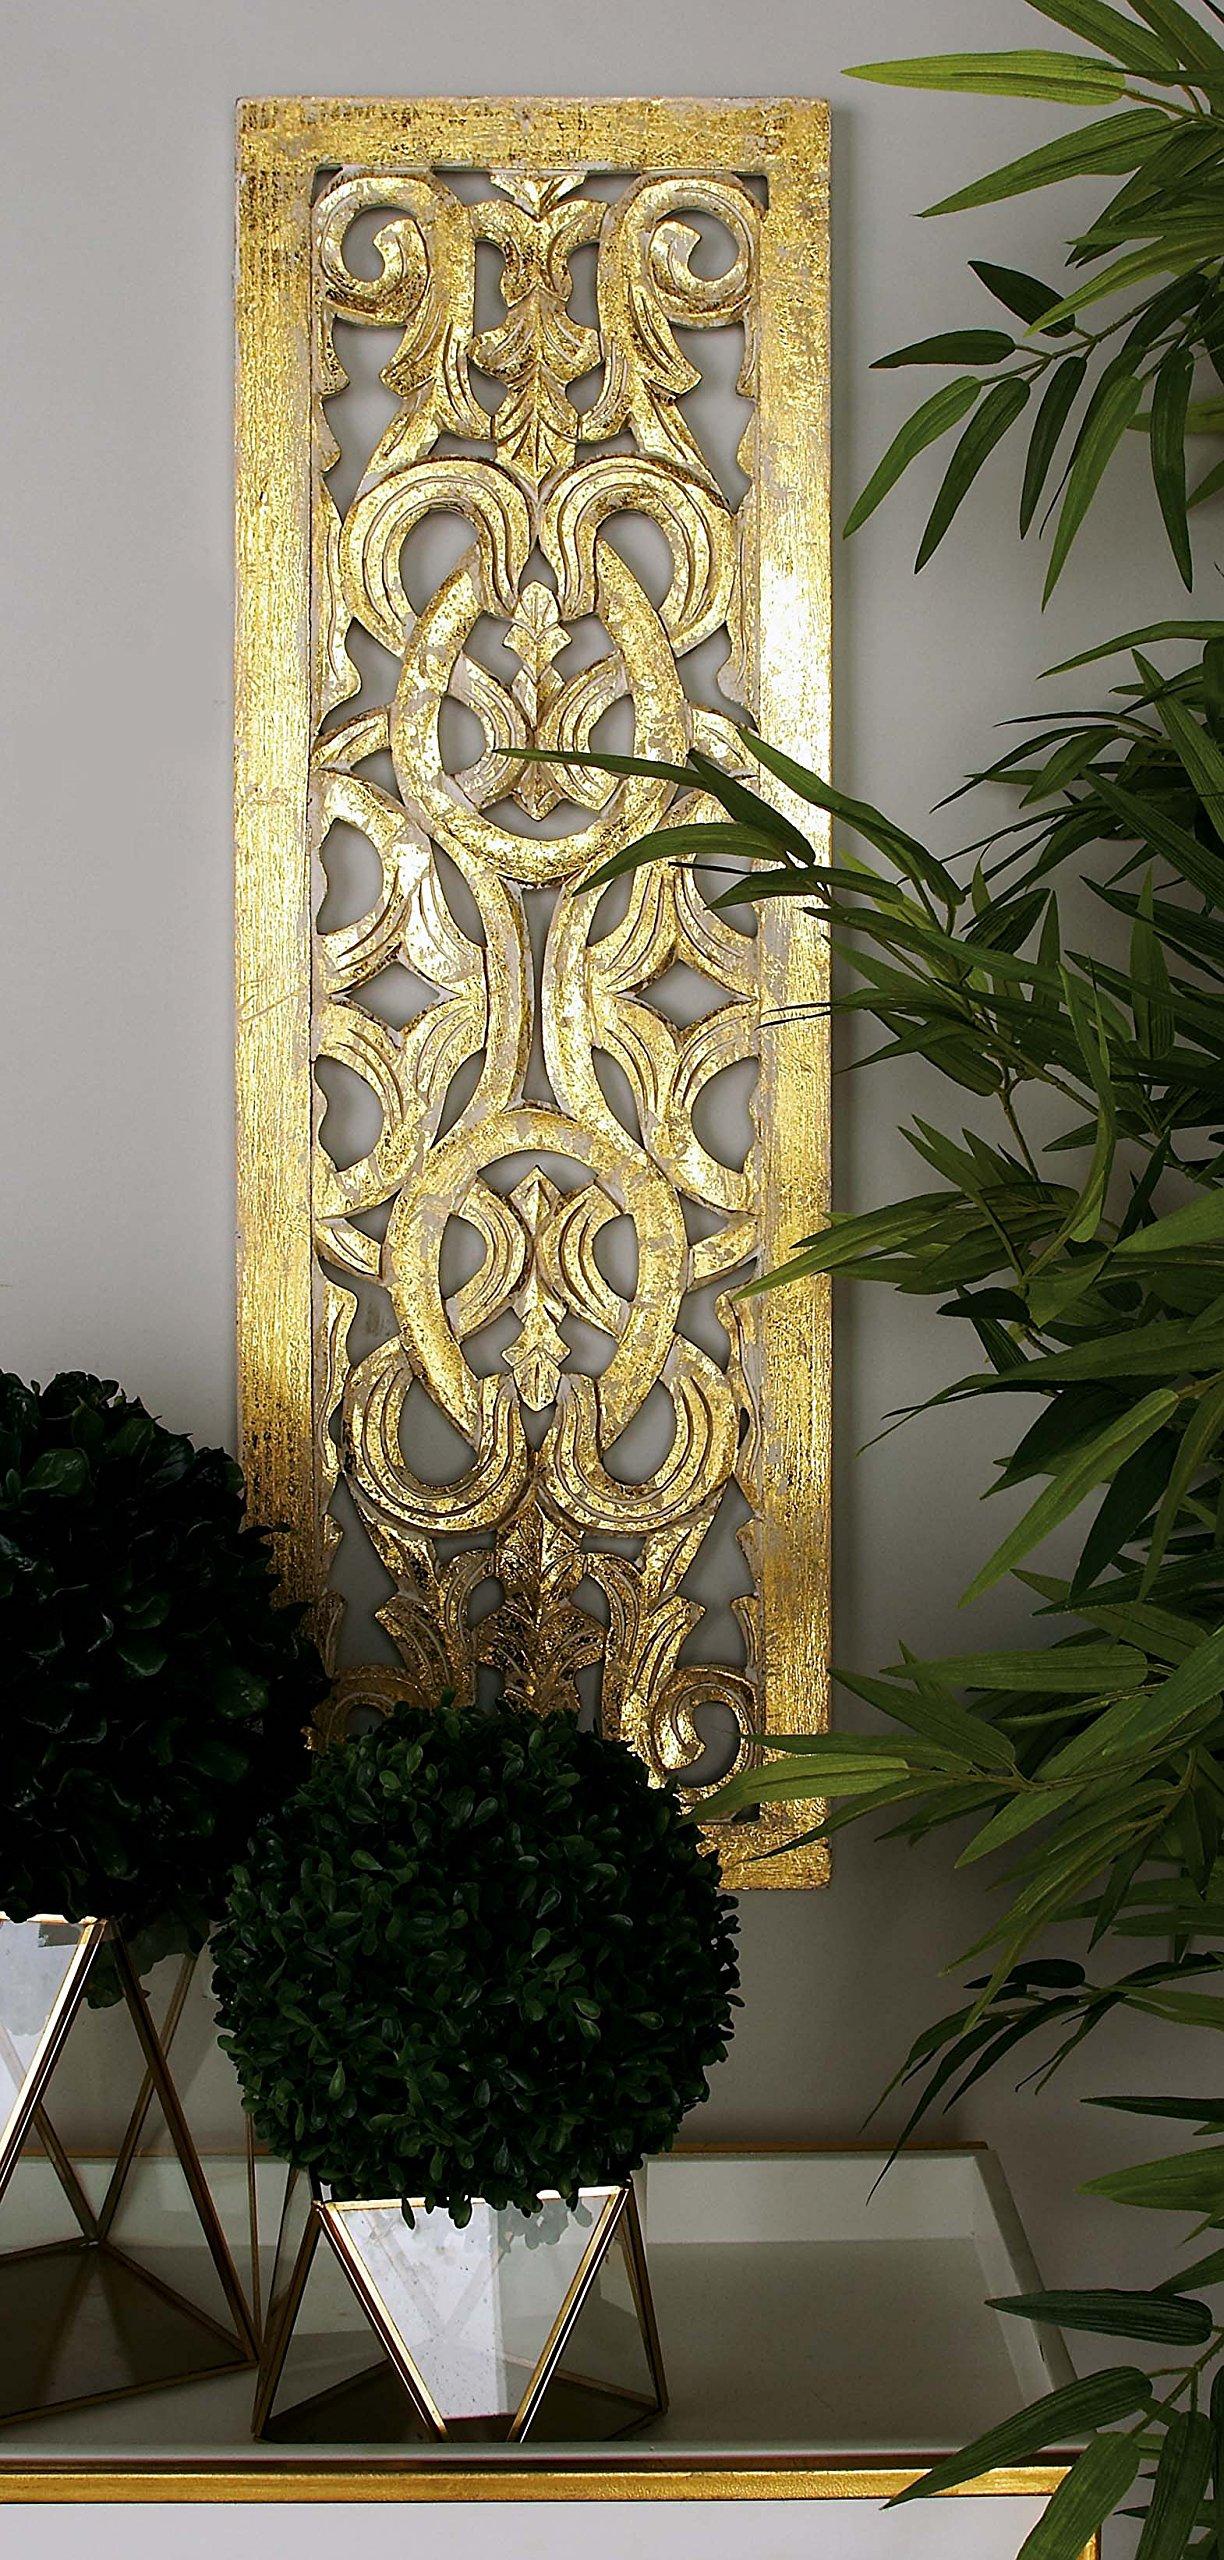 Deco 79 96070 Wood Wall Panel, 12'' x 36'', Gold